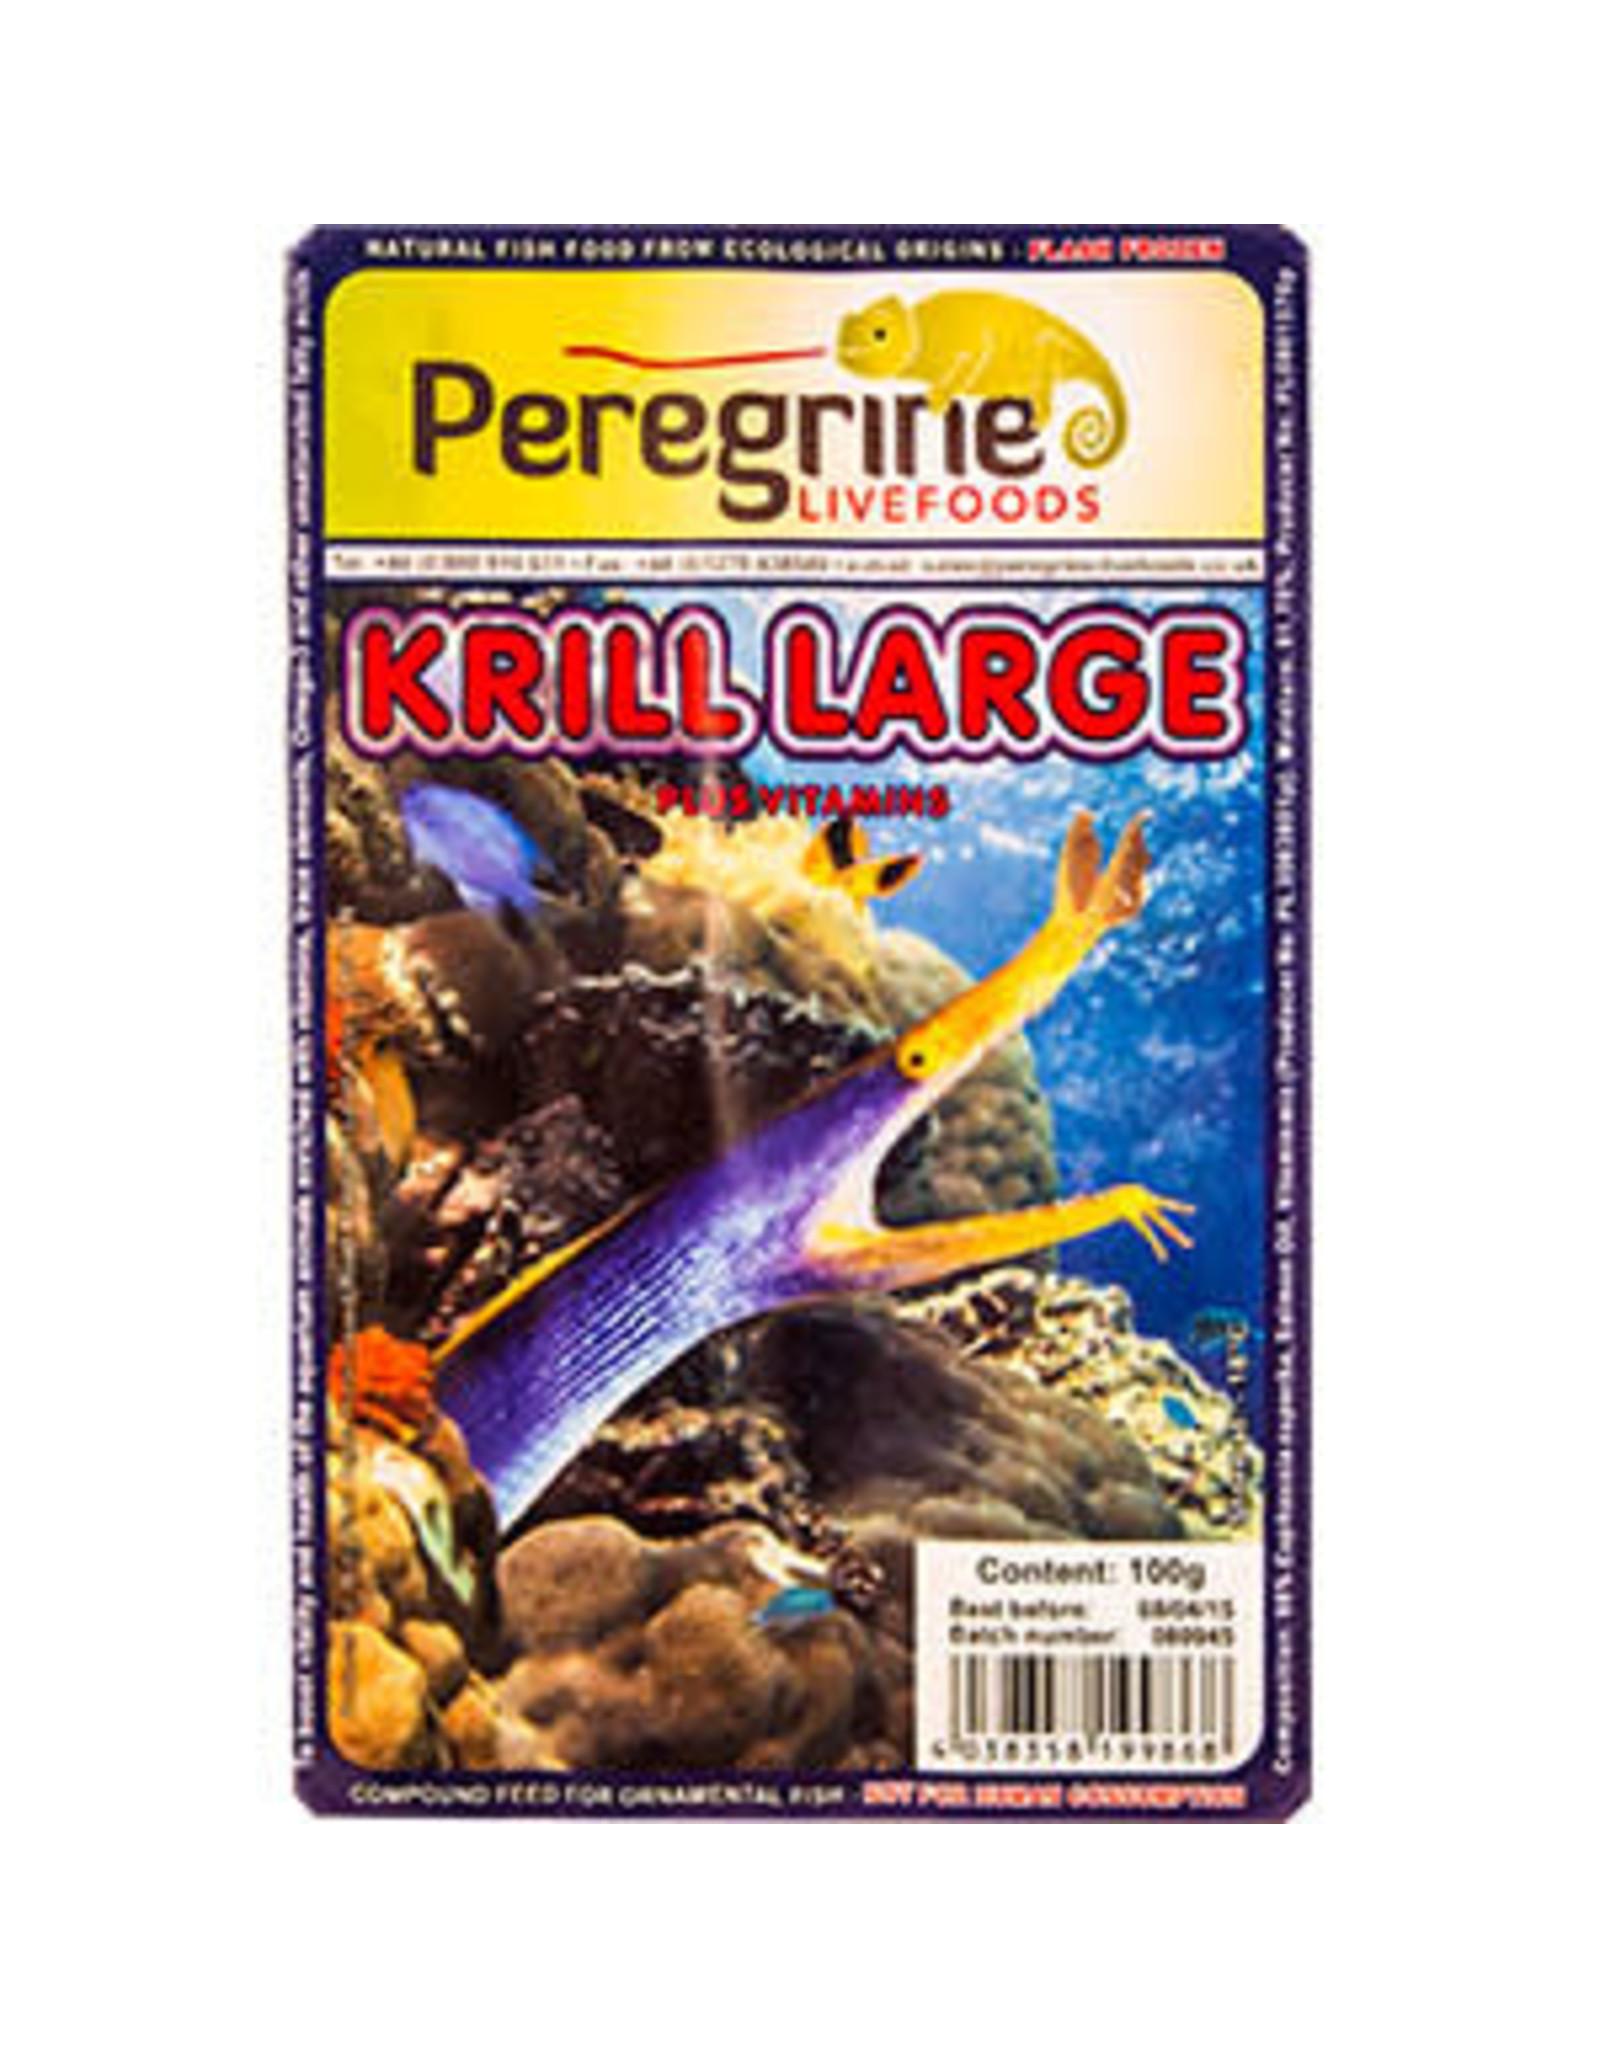 peregrine Frozen Krill Large Blister Pack 100g